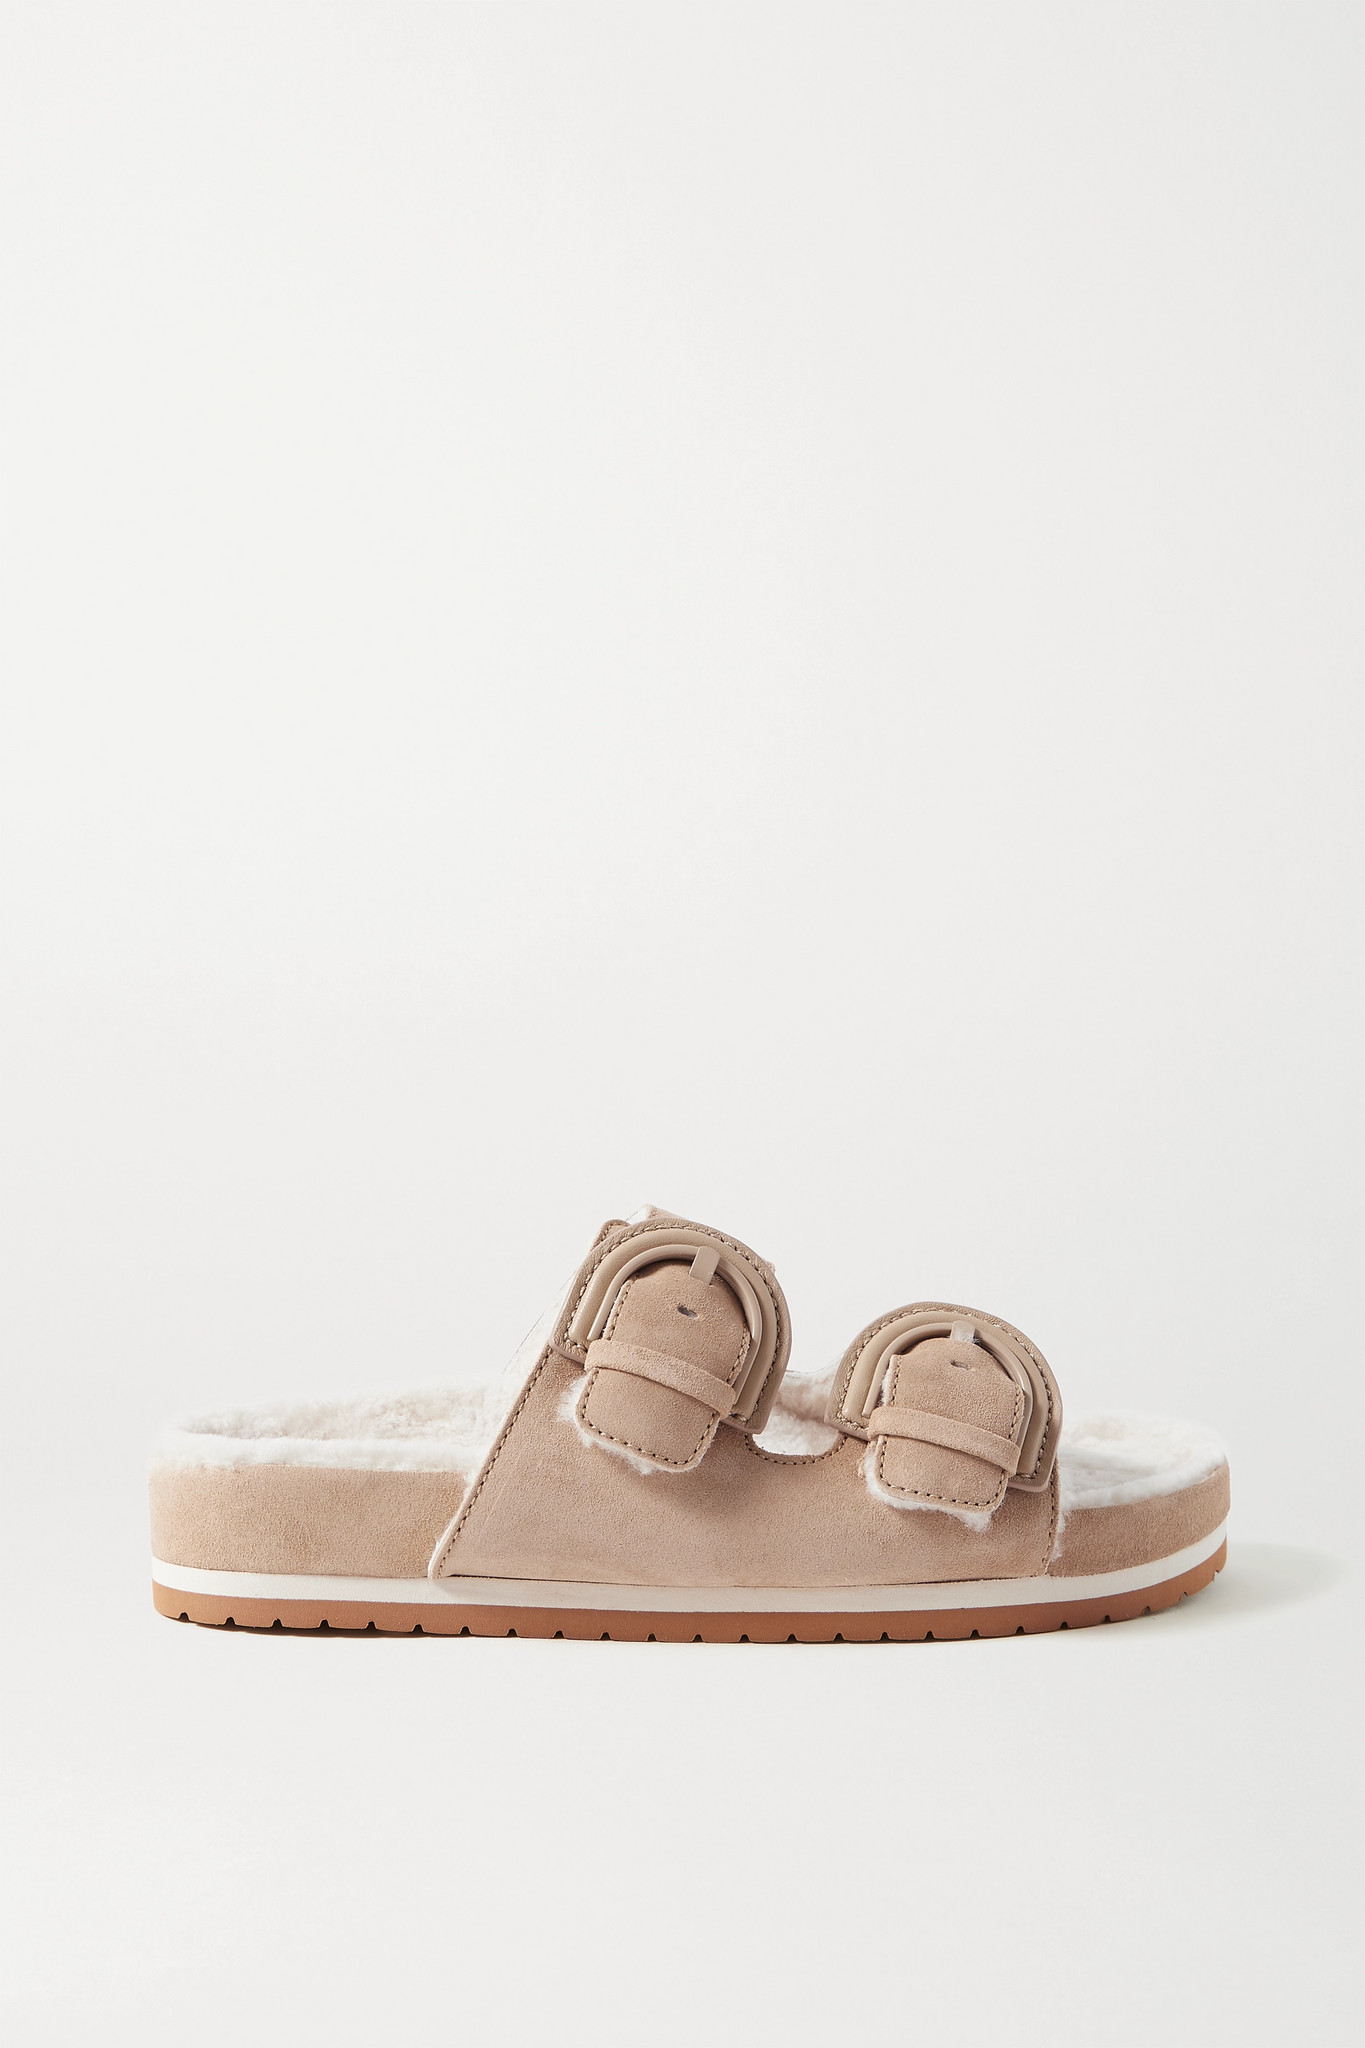 VINCE - Glyn 羊毛皮衬里绒面革拖鞋 - 中性色 - US9.5